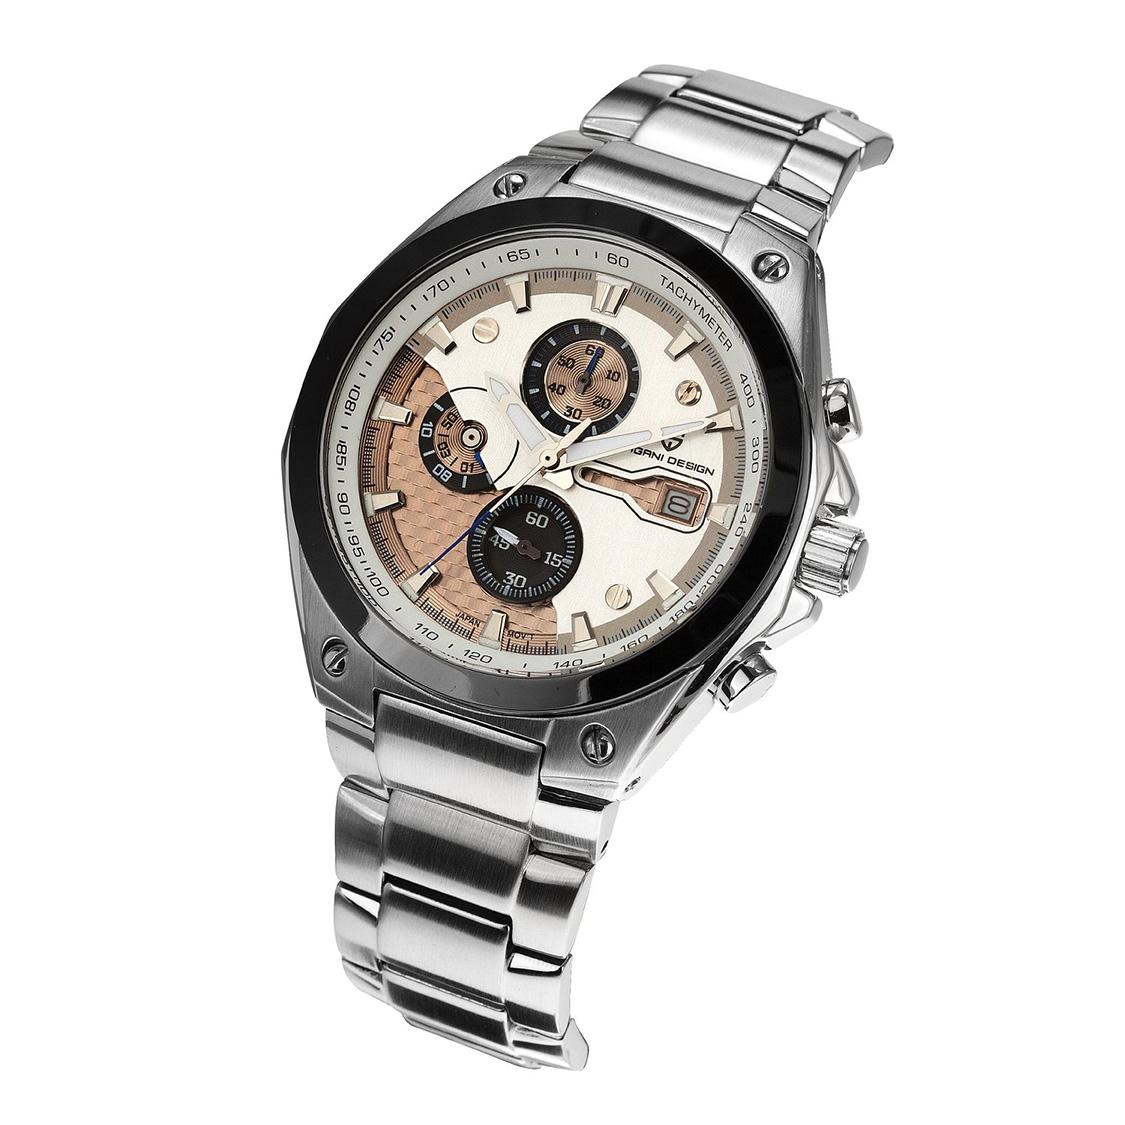 PAGANIDESIGN パガーニ クォーツ 腕時計 メンズ スポーツウォッチCX 0003並行輸入品 メーカー保証12ヶ月 純正ケース付きbf6y7gY